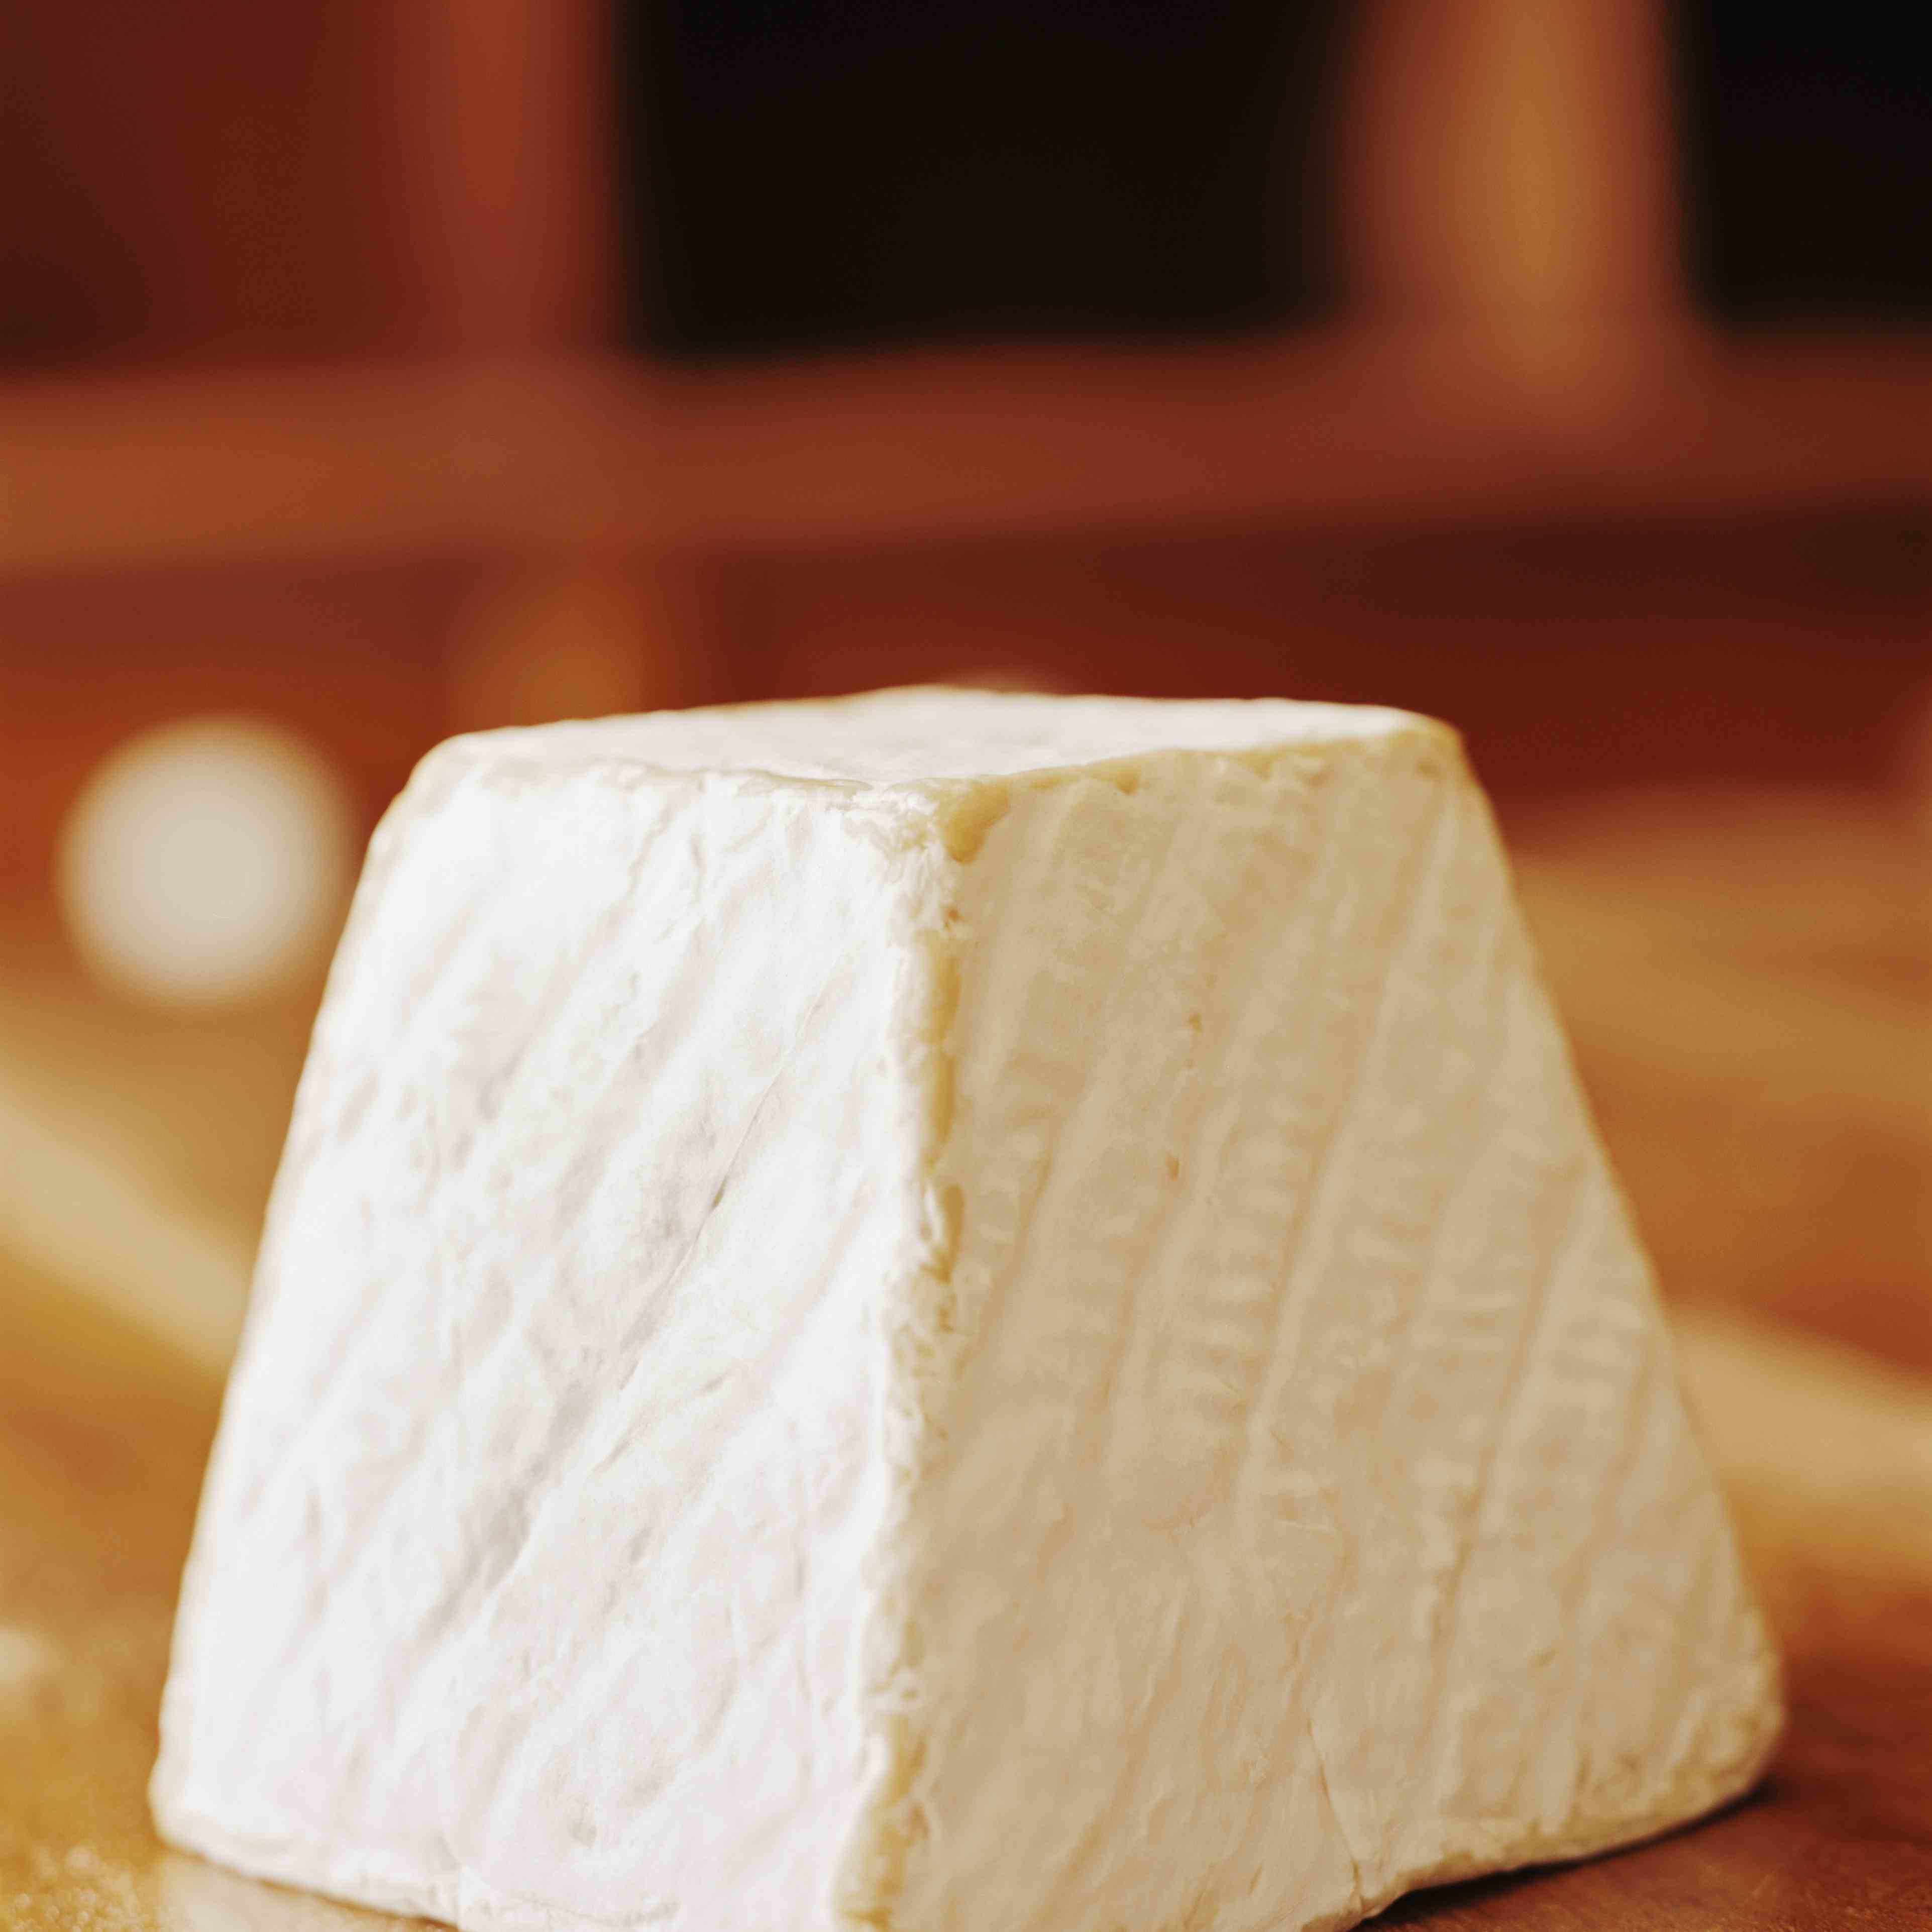 Vermont goat cheese